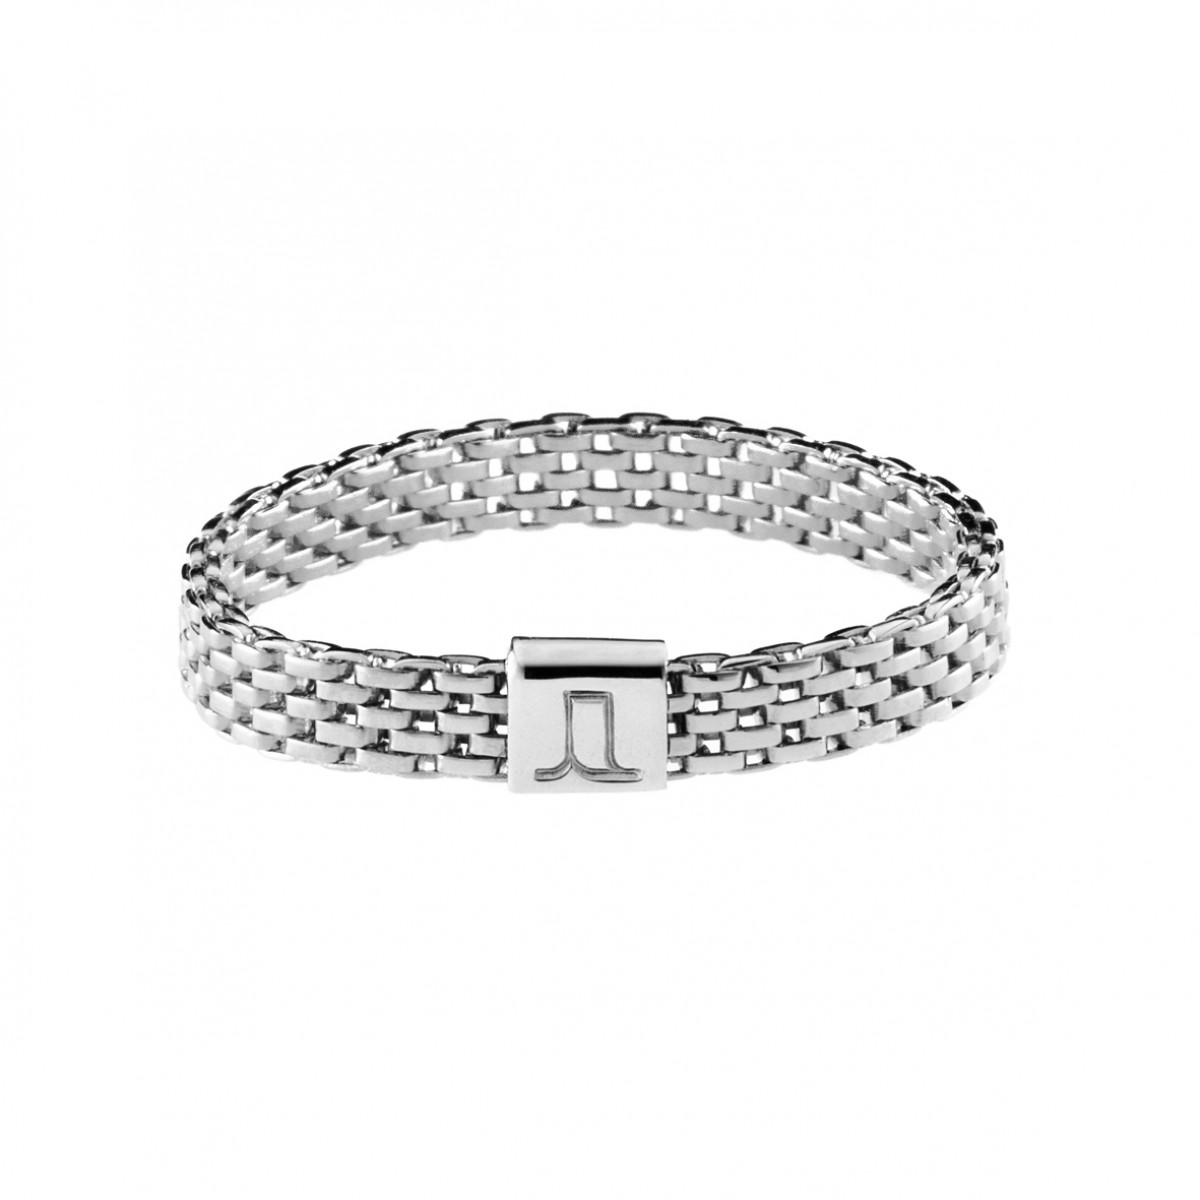 Jasmina Jovy Jewellery Decode! Mesh Ring RIDC00 fine silver plated